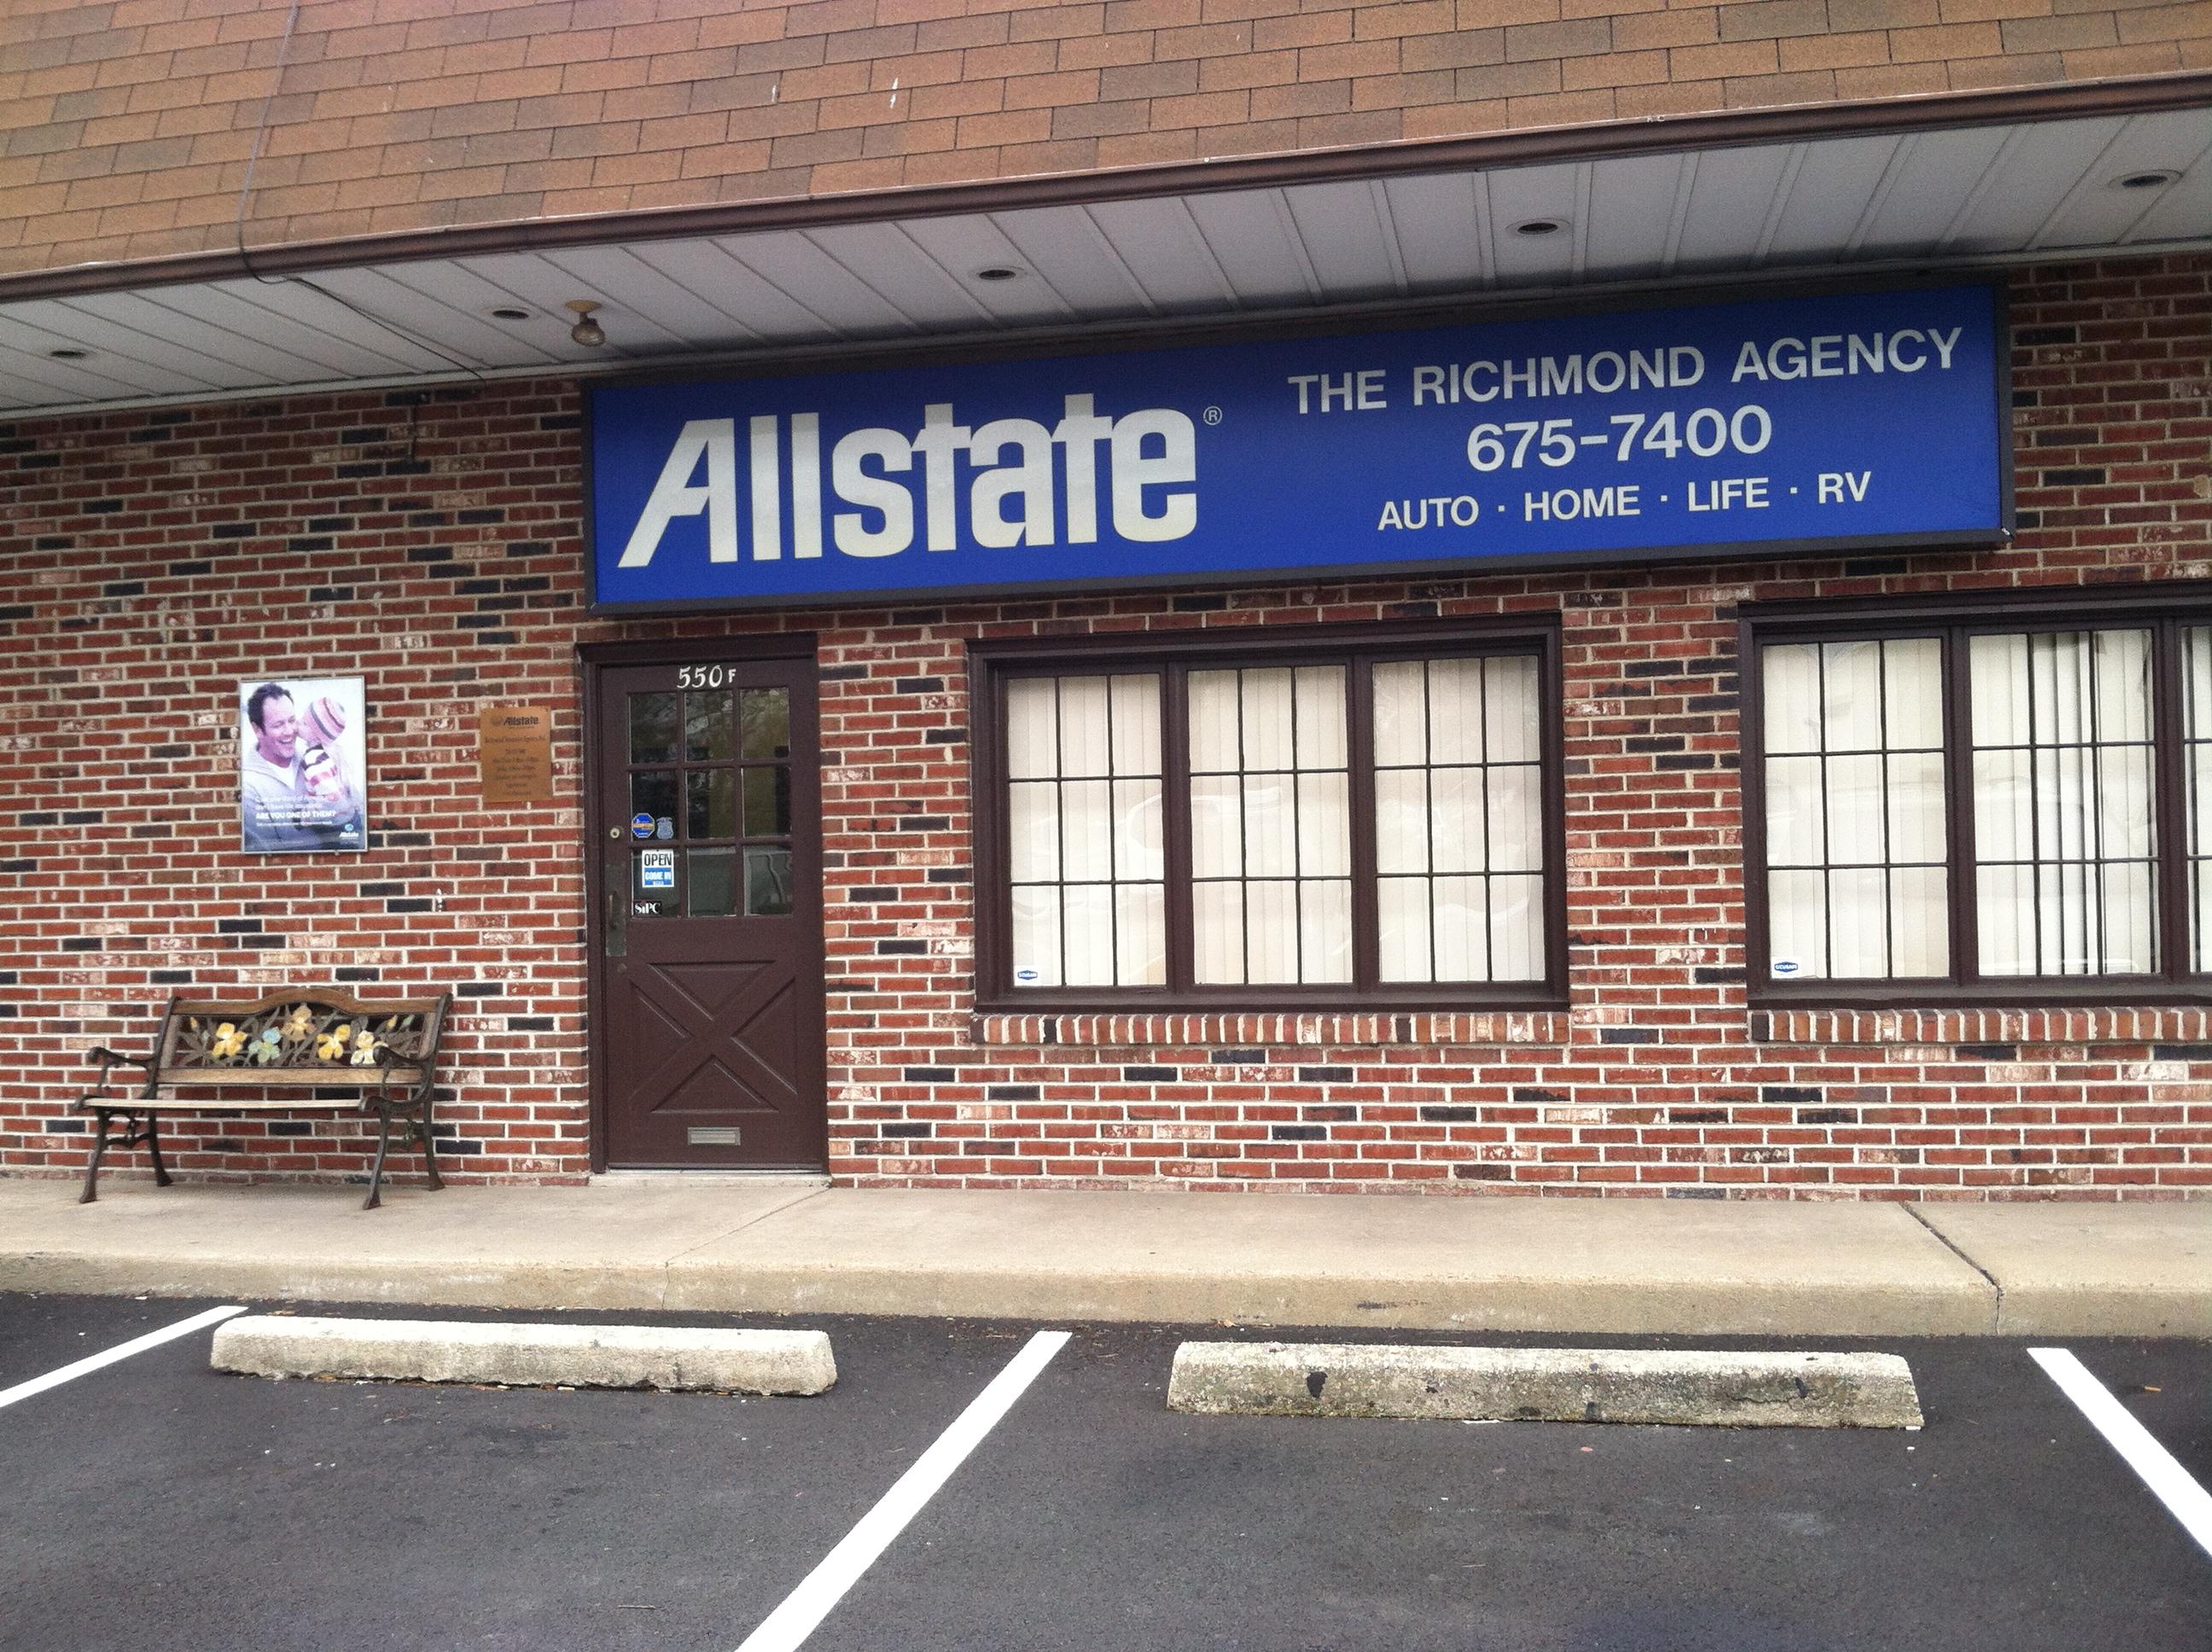 Steven Richmond: Allstate Insurance image 2